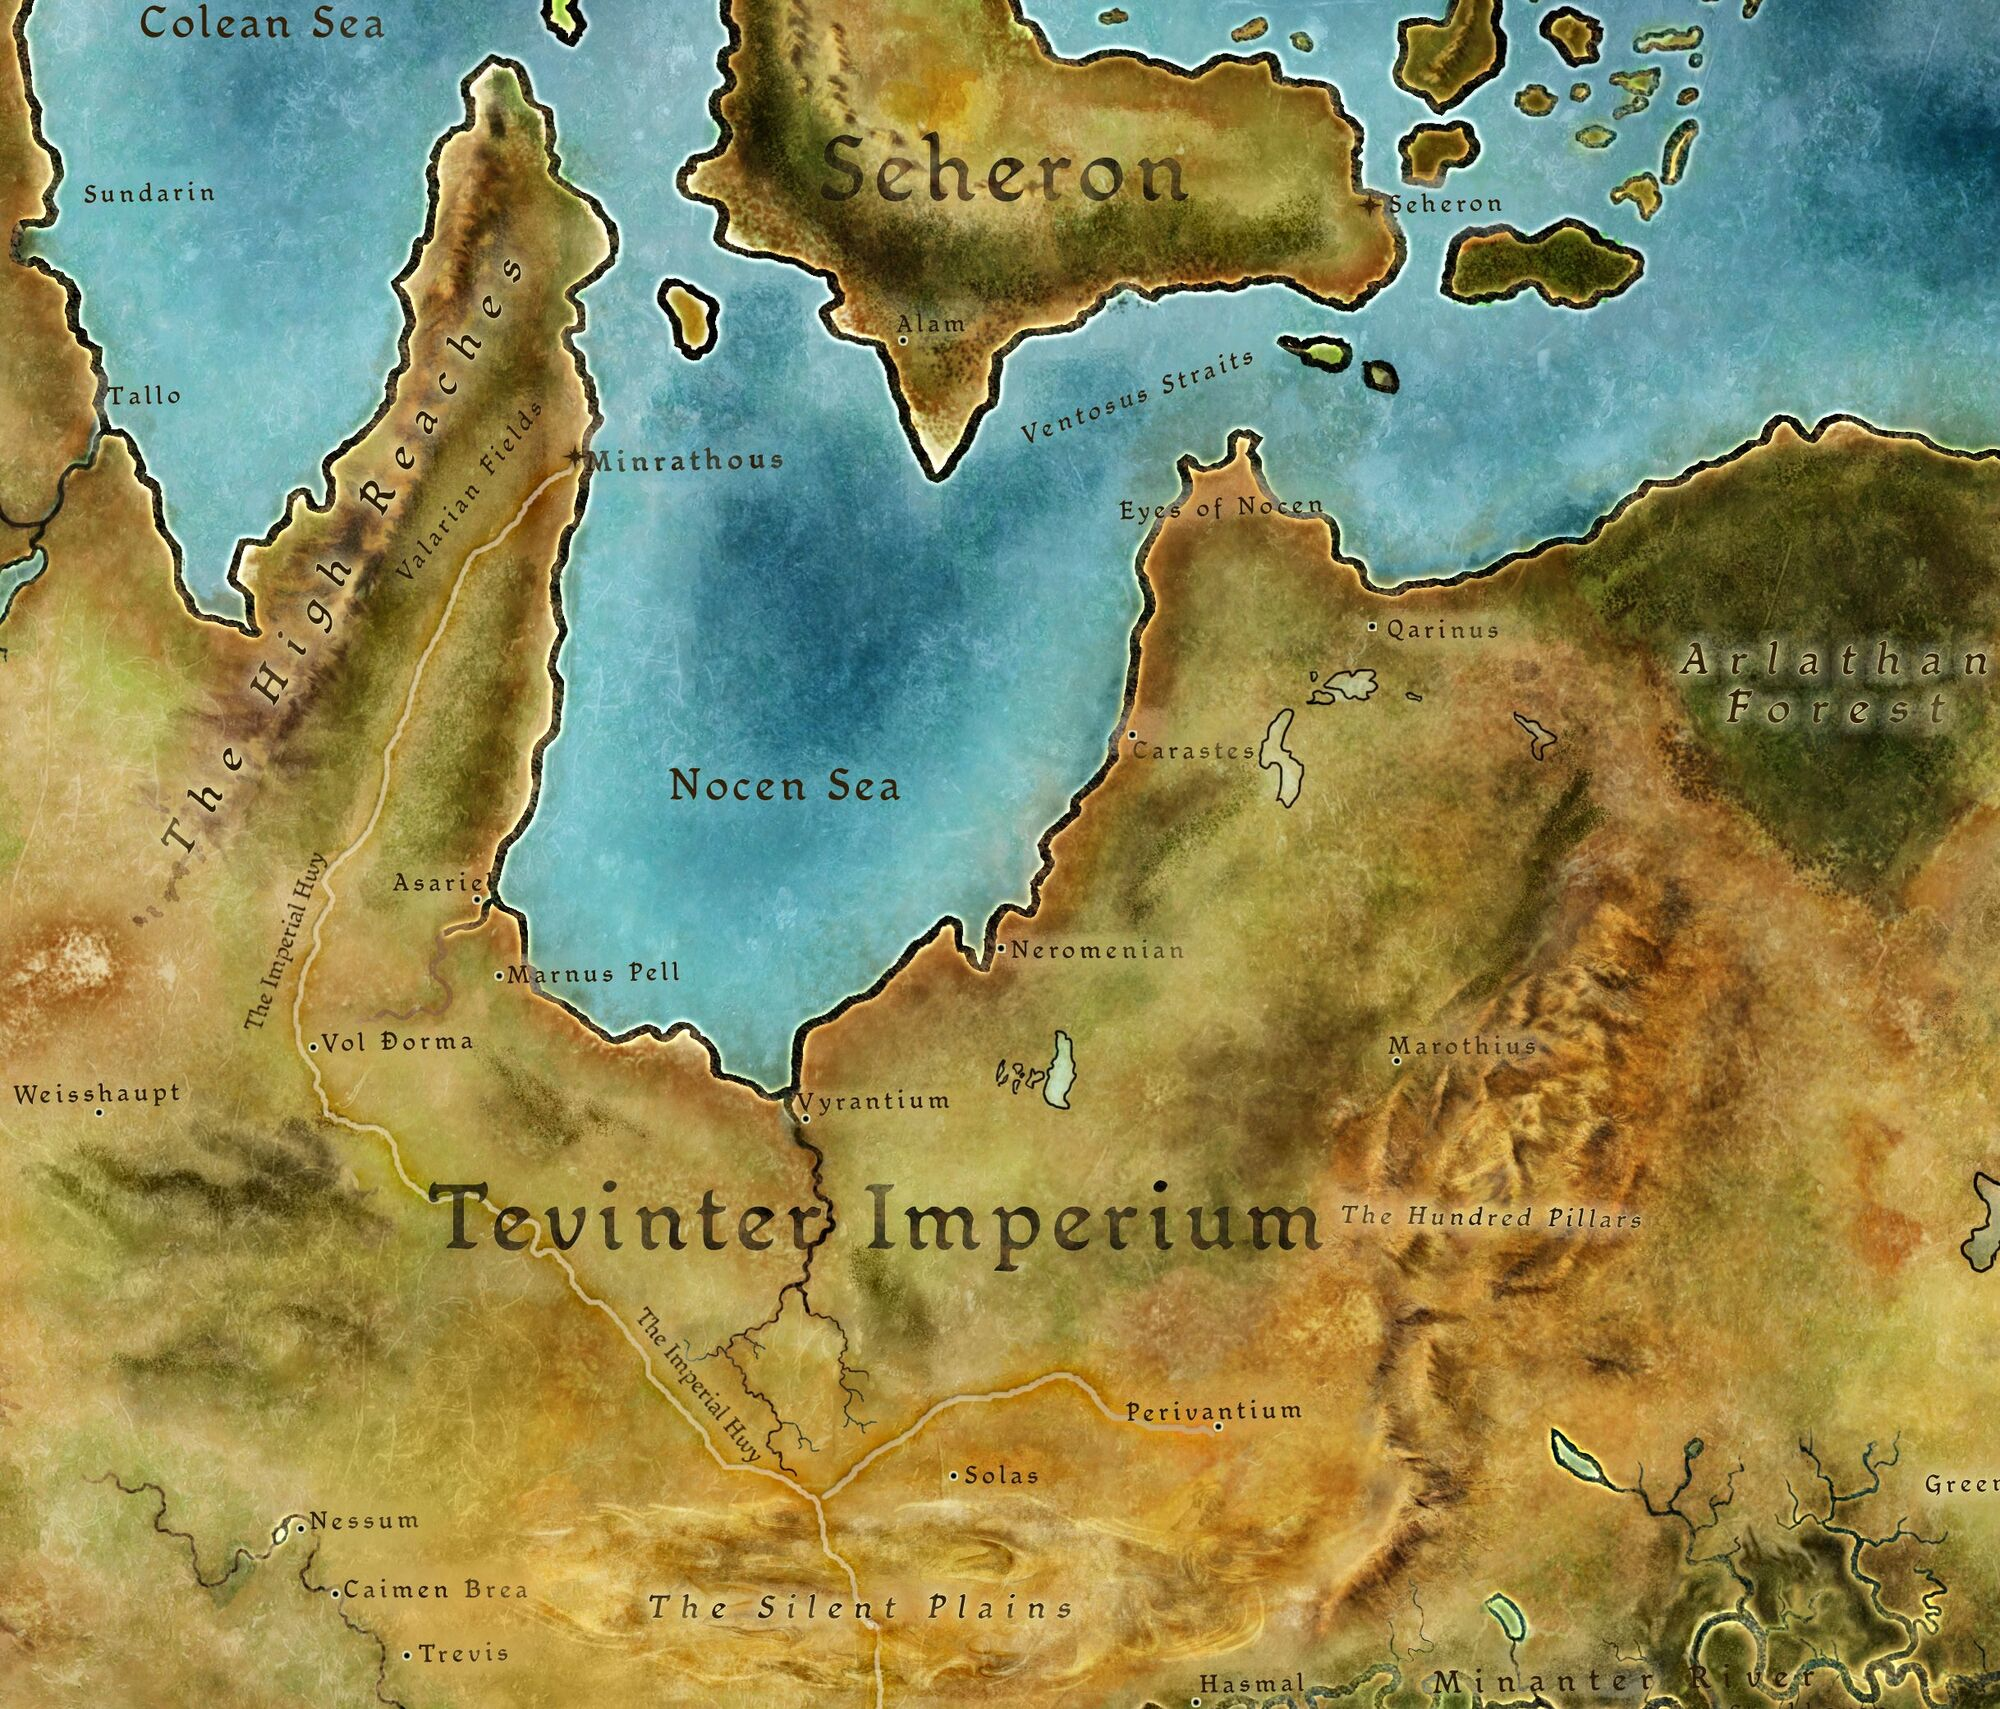 Tevinter Imperium | Dragon Age Wiki | FANDOM powered by Wikia